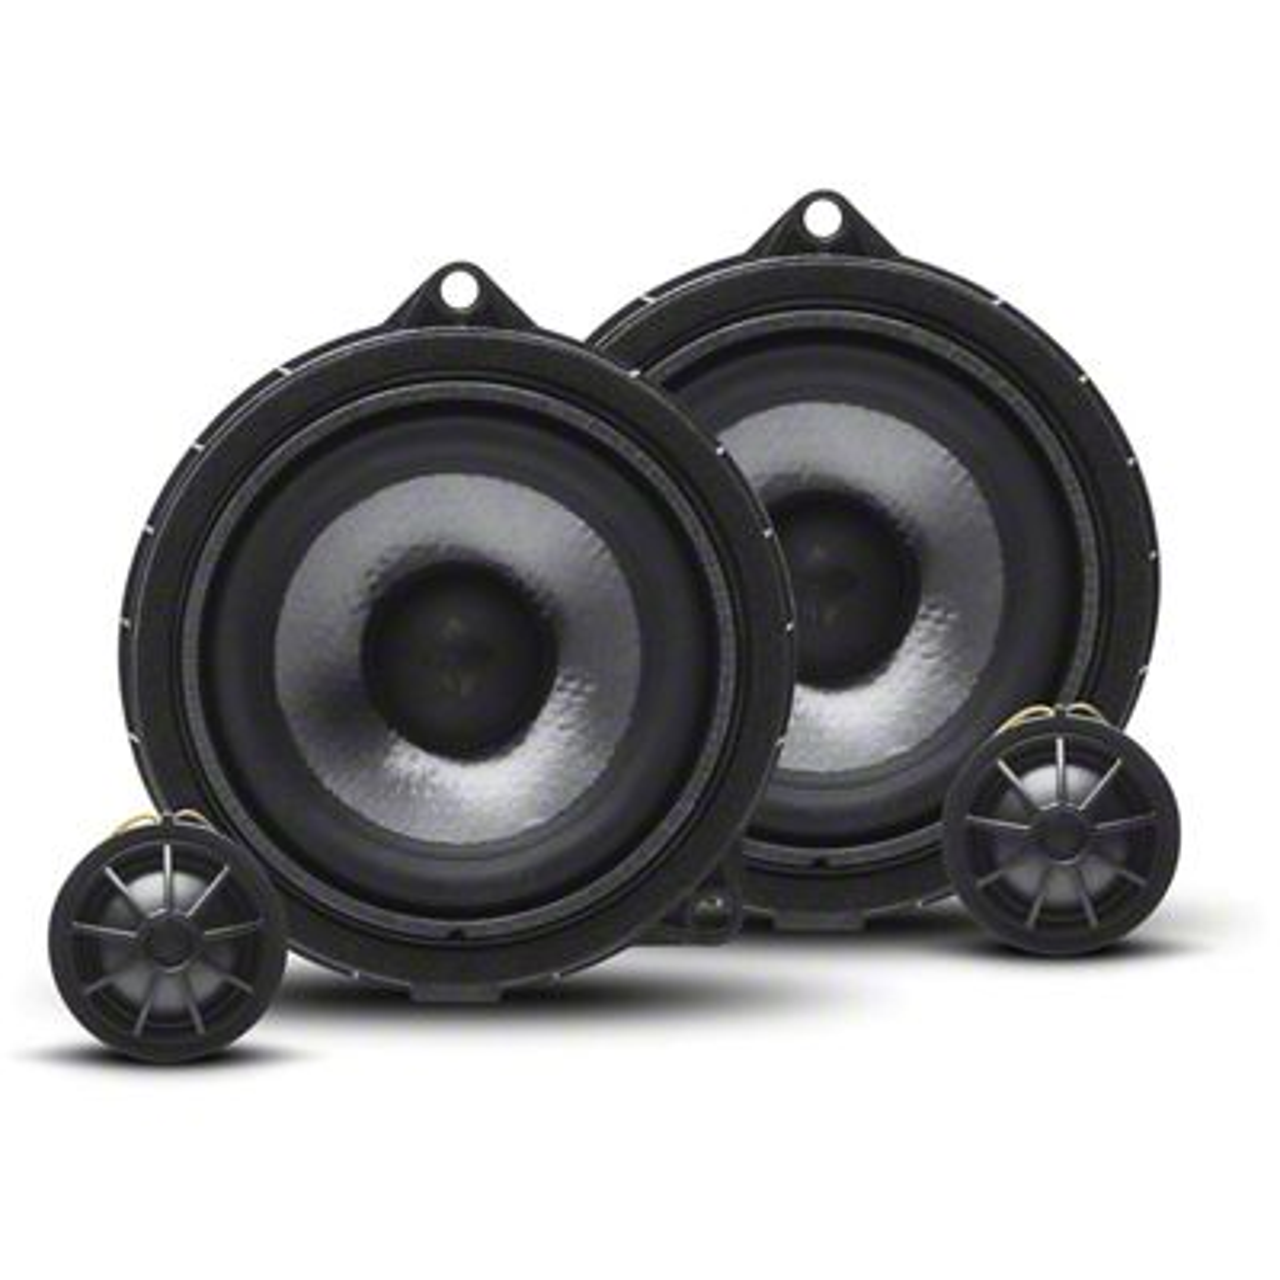 Rockford Fosgate 8 Speaker System Upgrade (18-19 Jeep Wrangler JL)